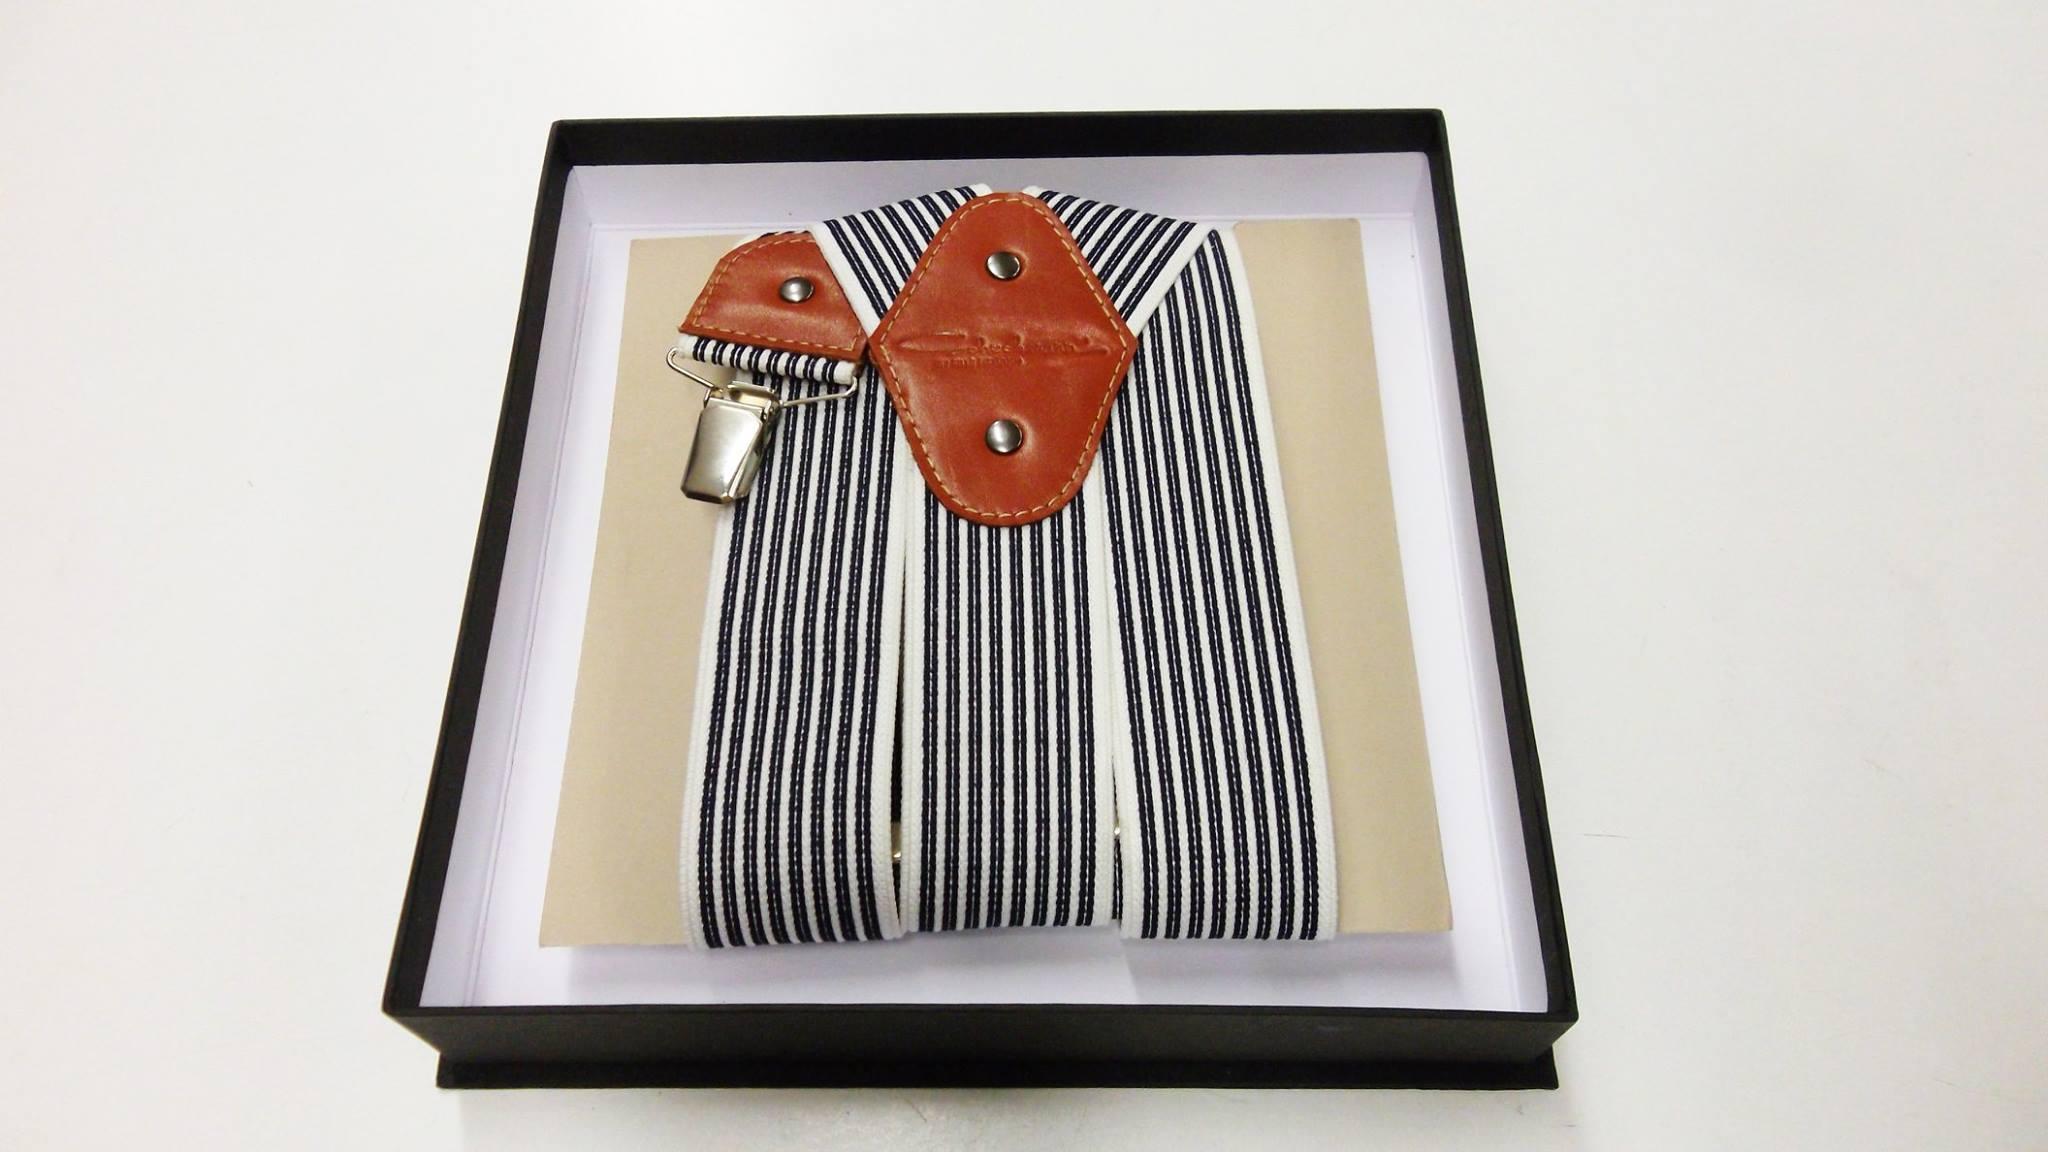 1010ca46e88 suspenders by Scheckmann – Eesti Disaini Maja / Estonian Design House